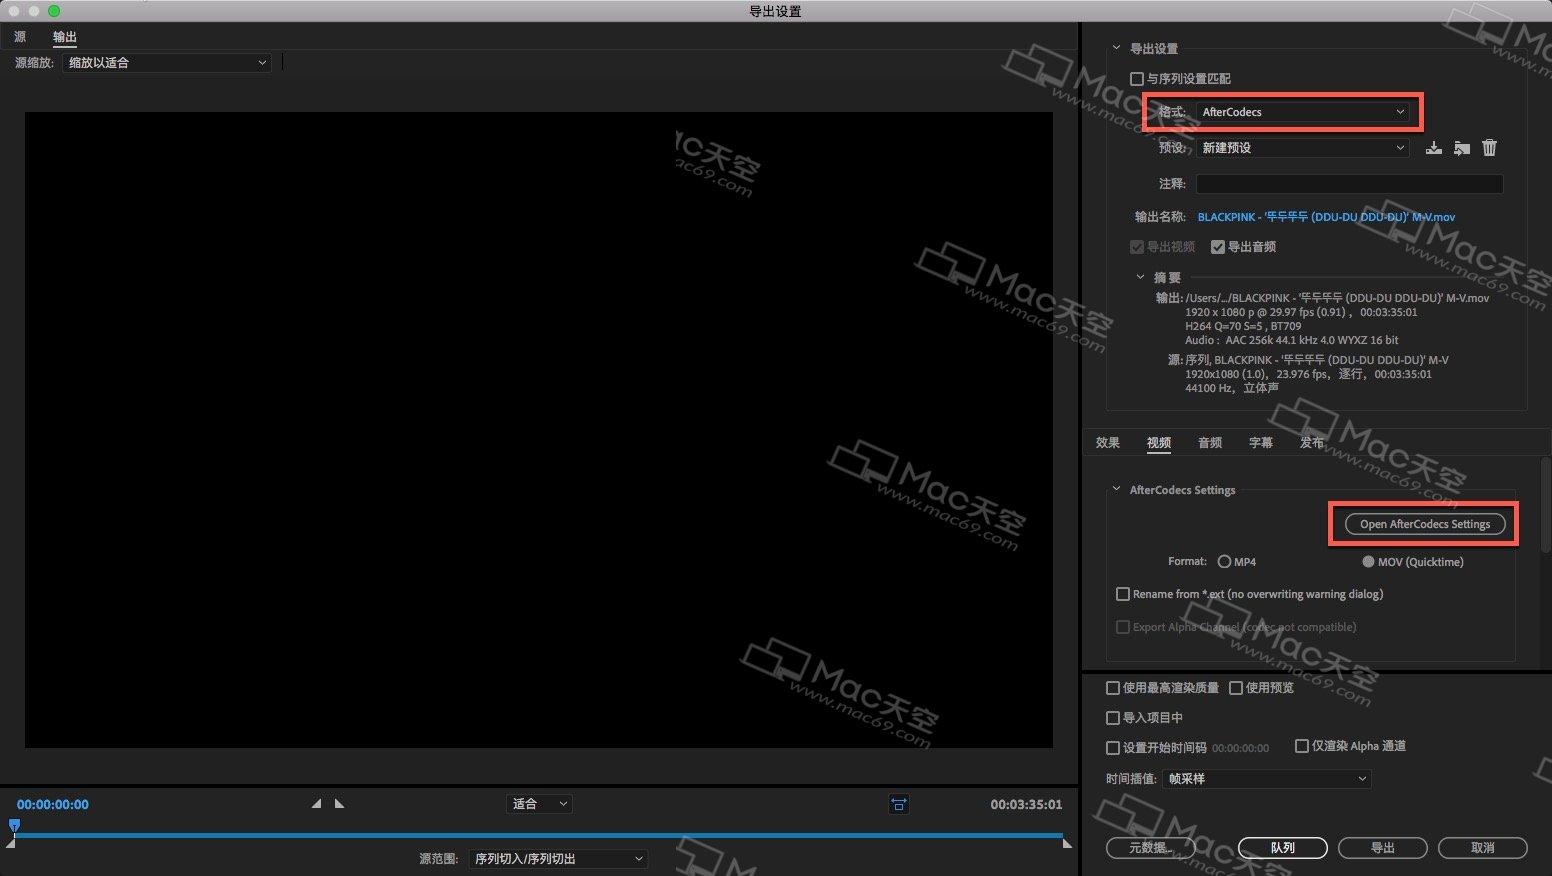 AfterCodecs for Mac(AE/PR/ME编码加速输出渲染插件)含序列号